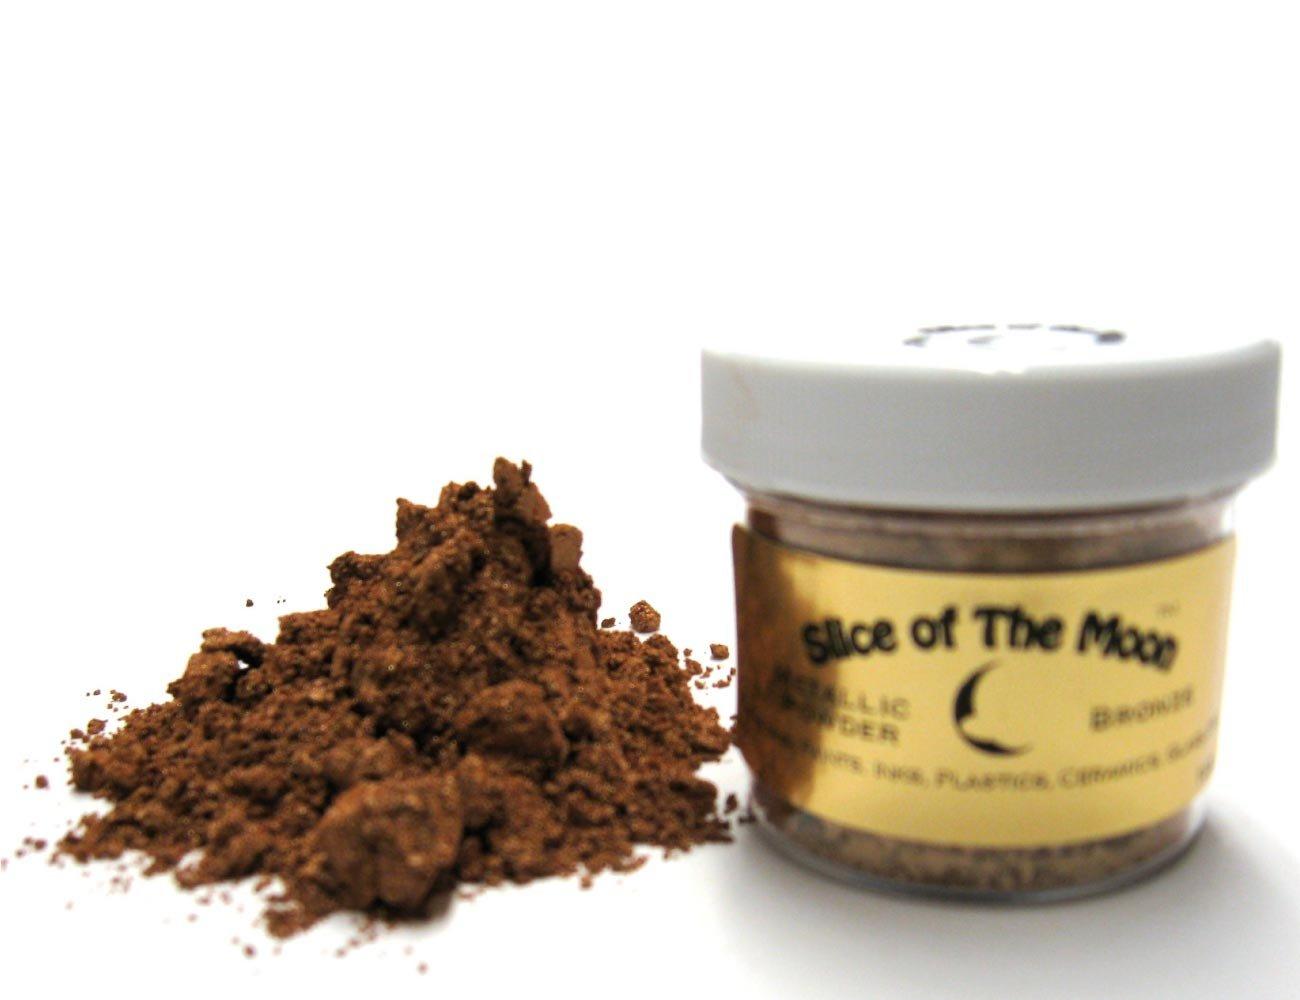 Bronze Mica Powder 1oz, Bronze Metallic Powder, Cosmetic Mica, Slice of the Moon